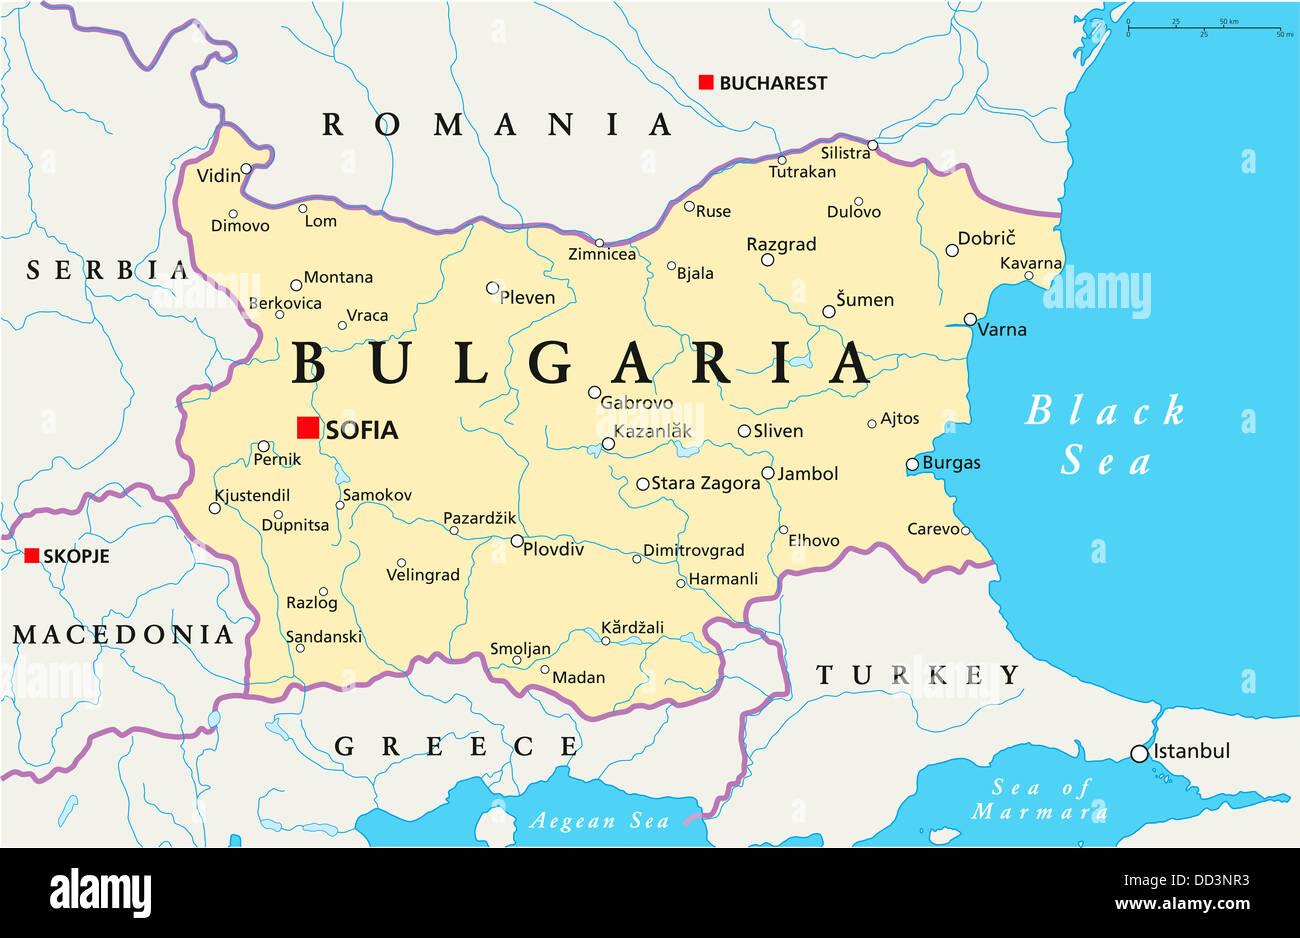 how to call bulgaria for free